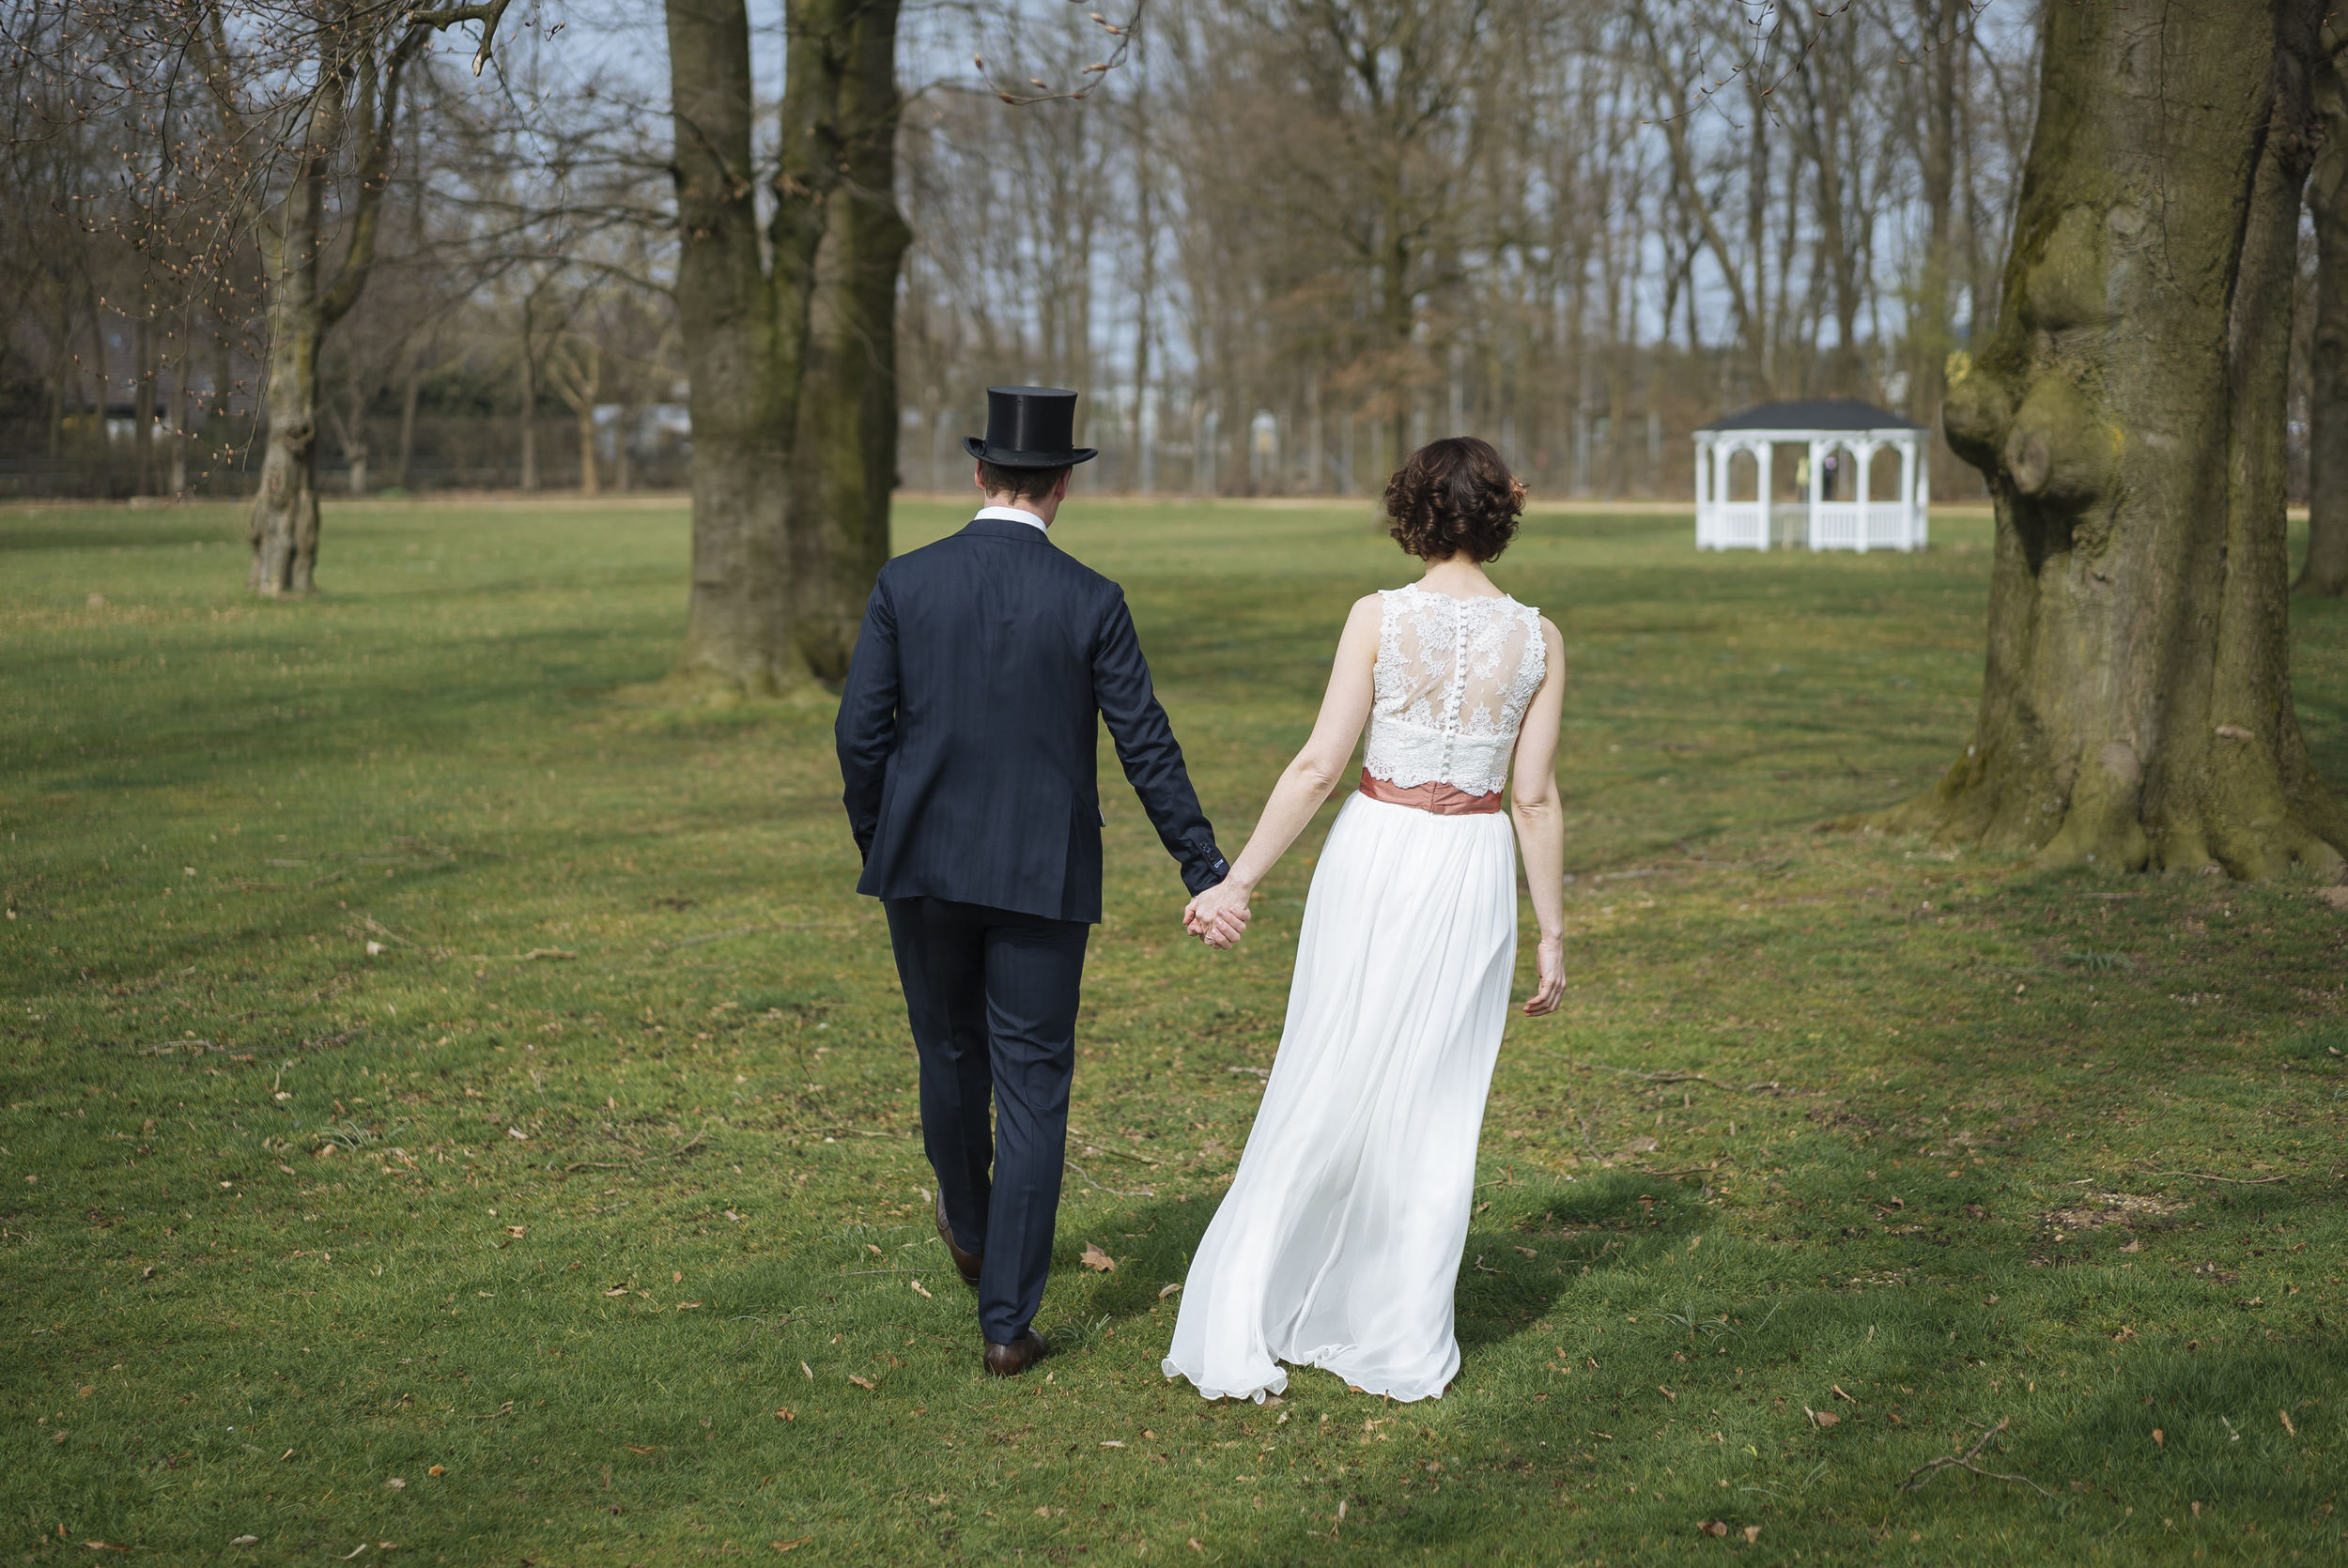 Hochzeitsfotograf-Schlossruine-Hertefeld-Weeze-044.jpg